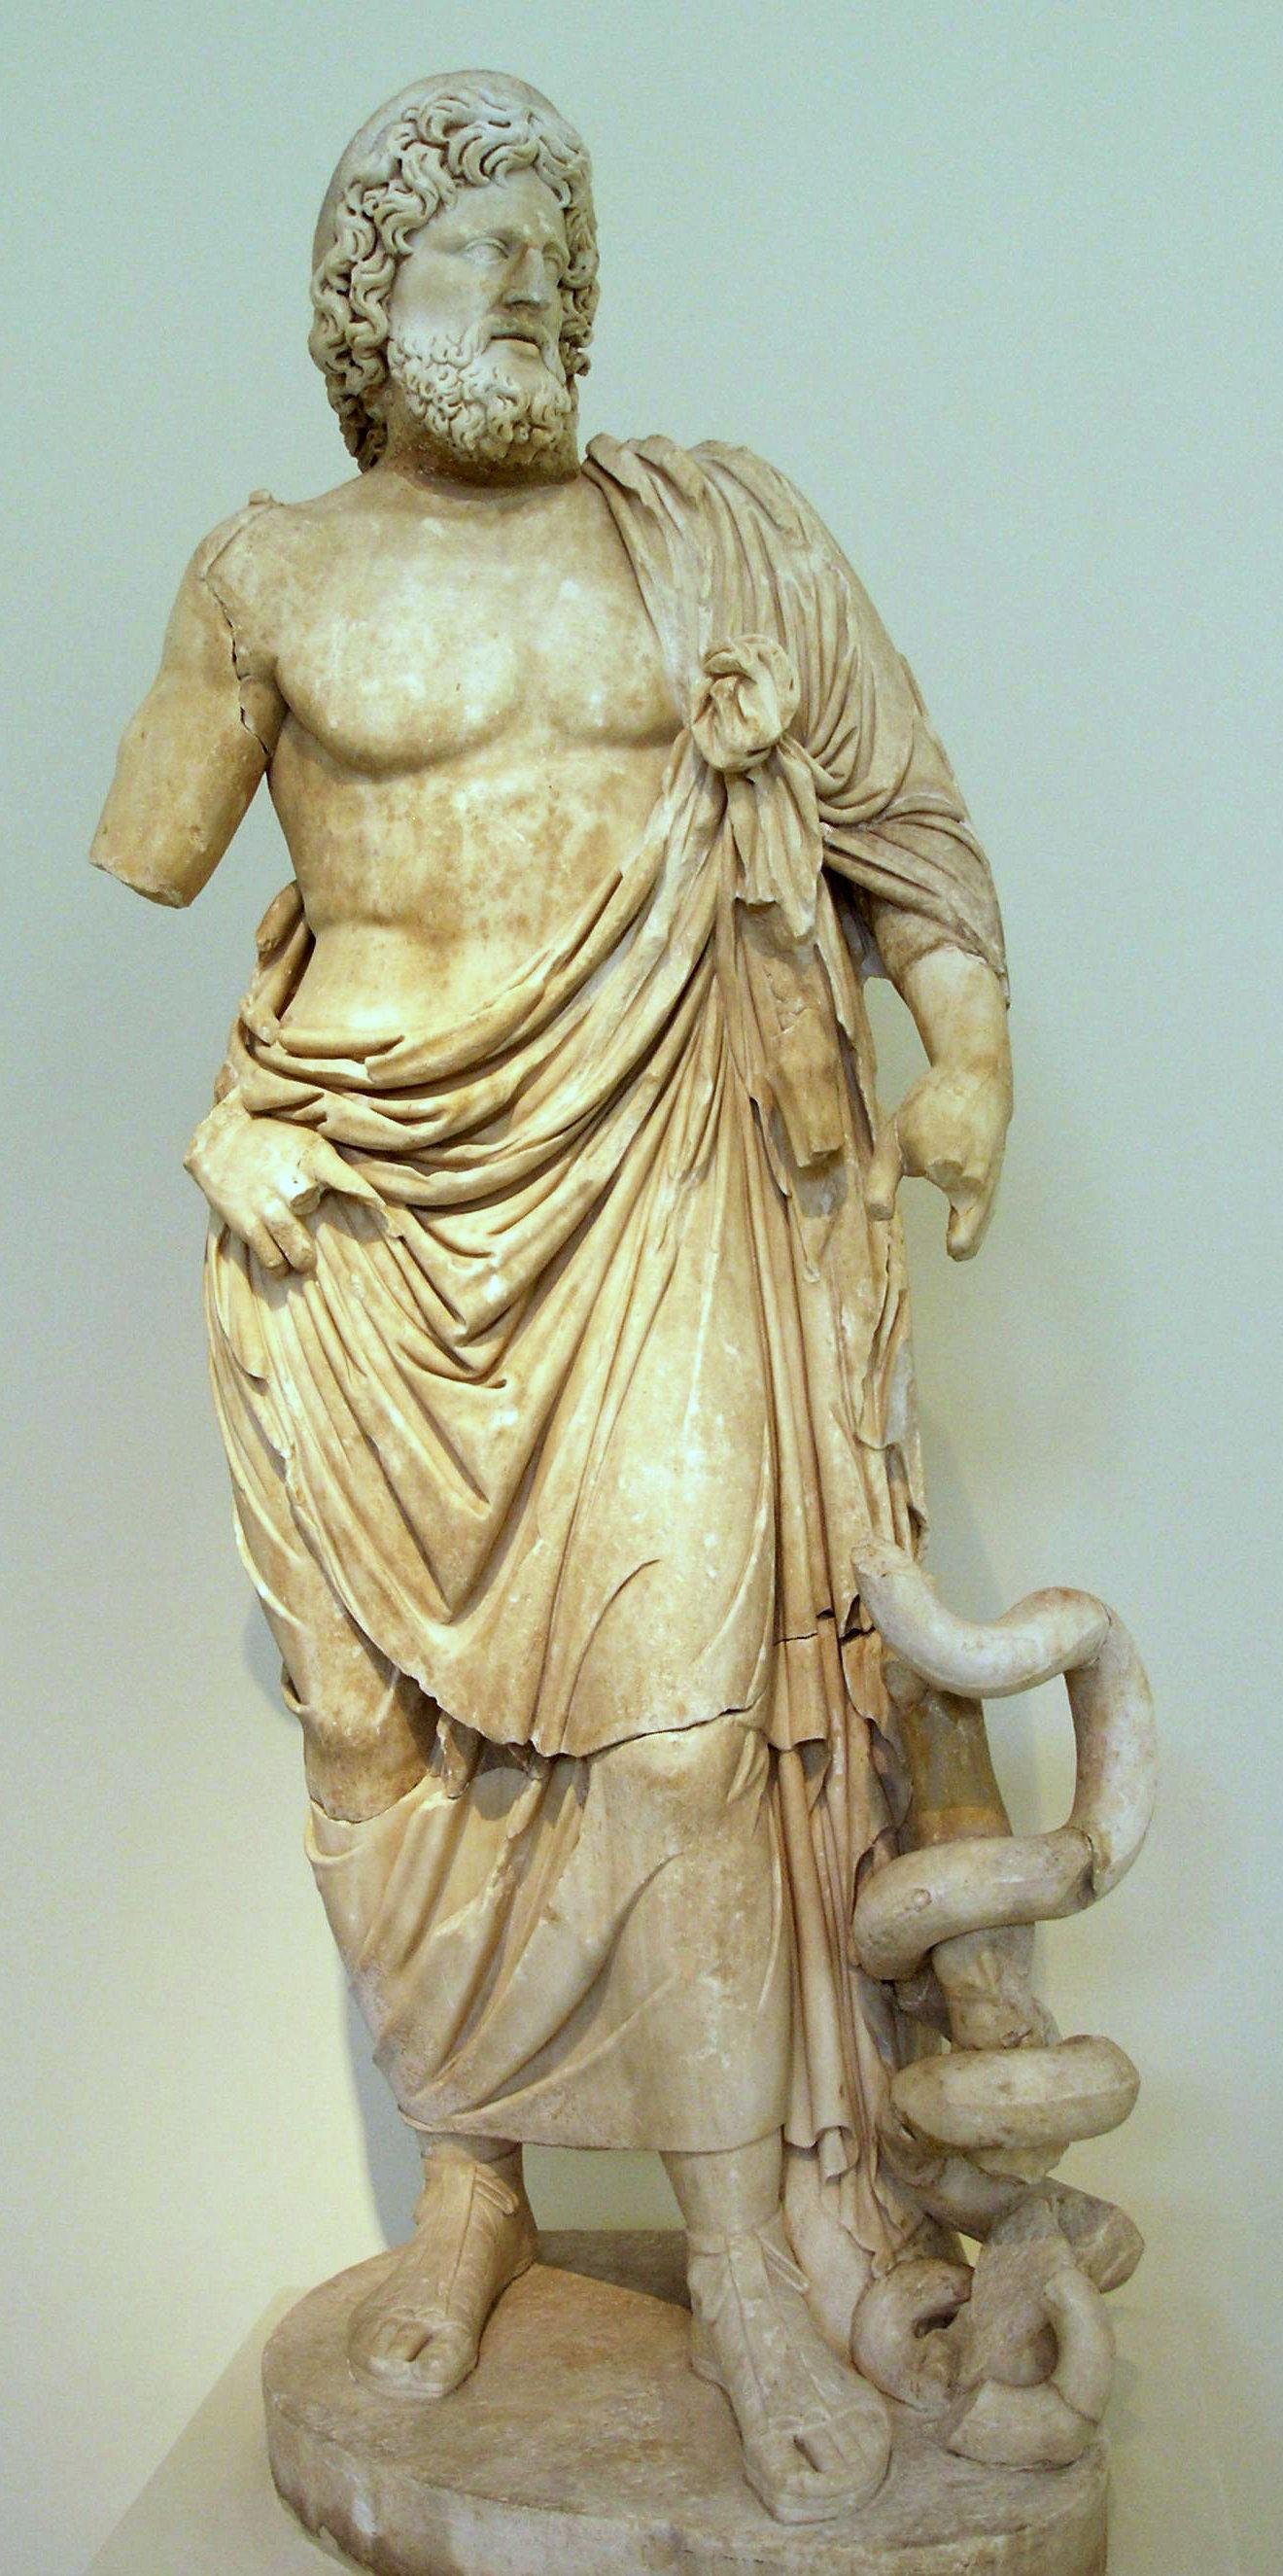 asclepios dieu grec de la medecine le blog de la grange. Black Bedroom Furniture Sets. Home Design Ideas